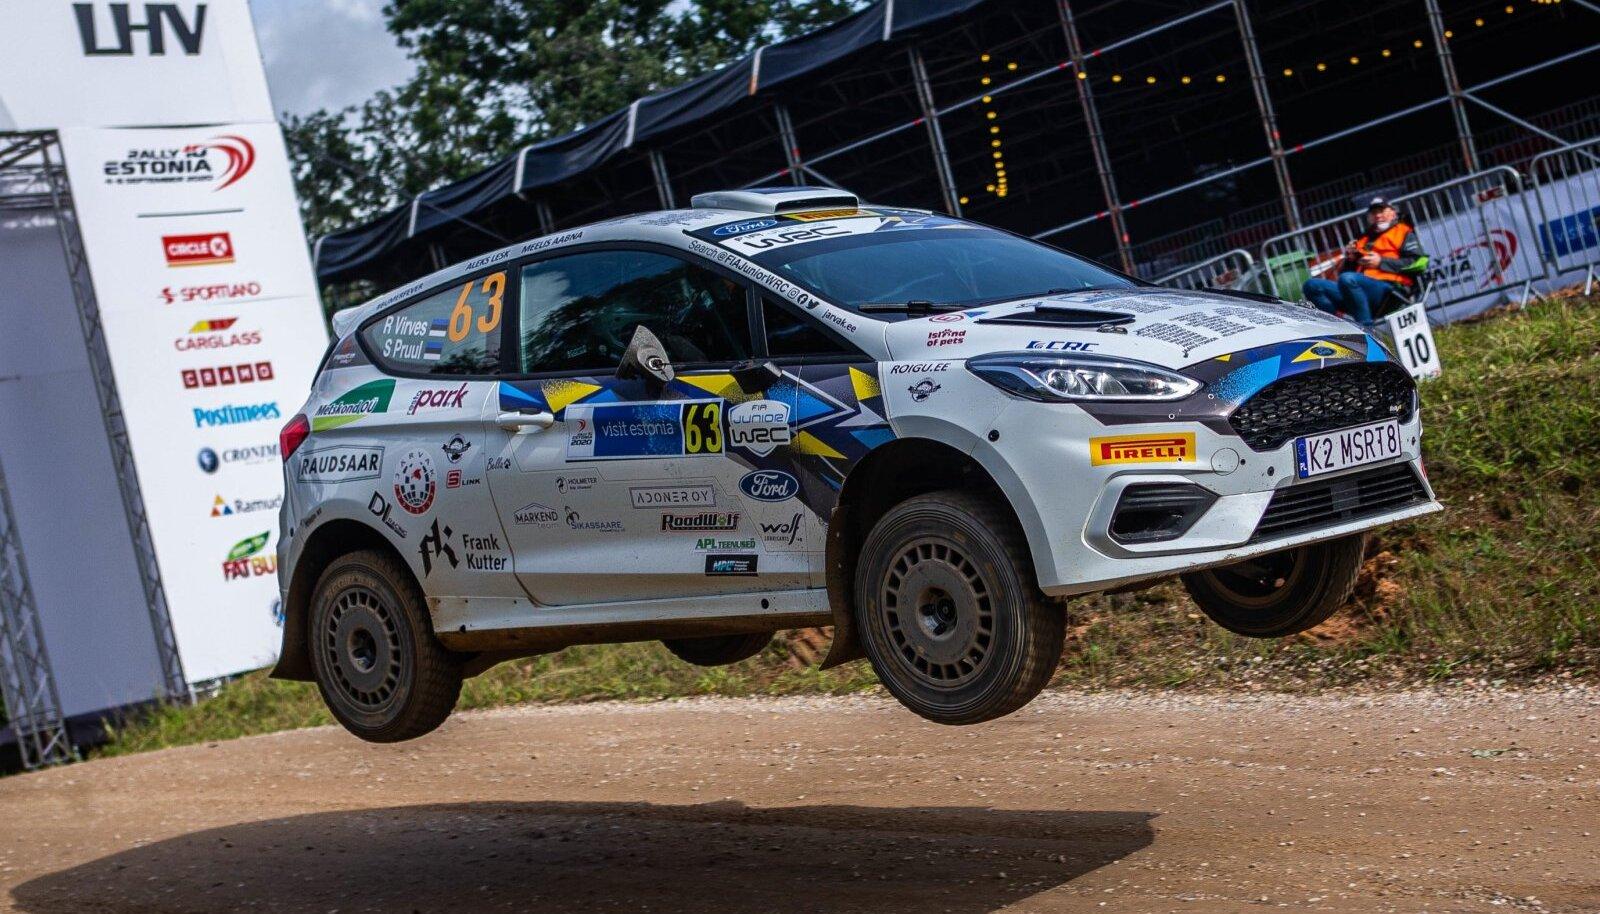 Robert Virves sai JWRC-klassis Eesti MM-etapil kolmanda koha.